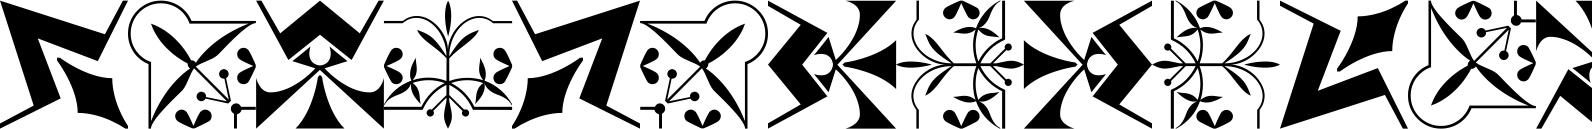 Polytype Dumas I Frames